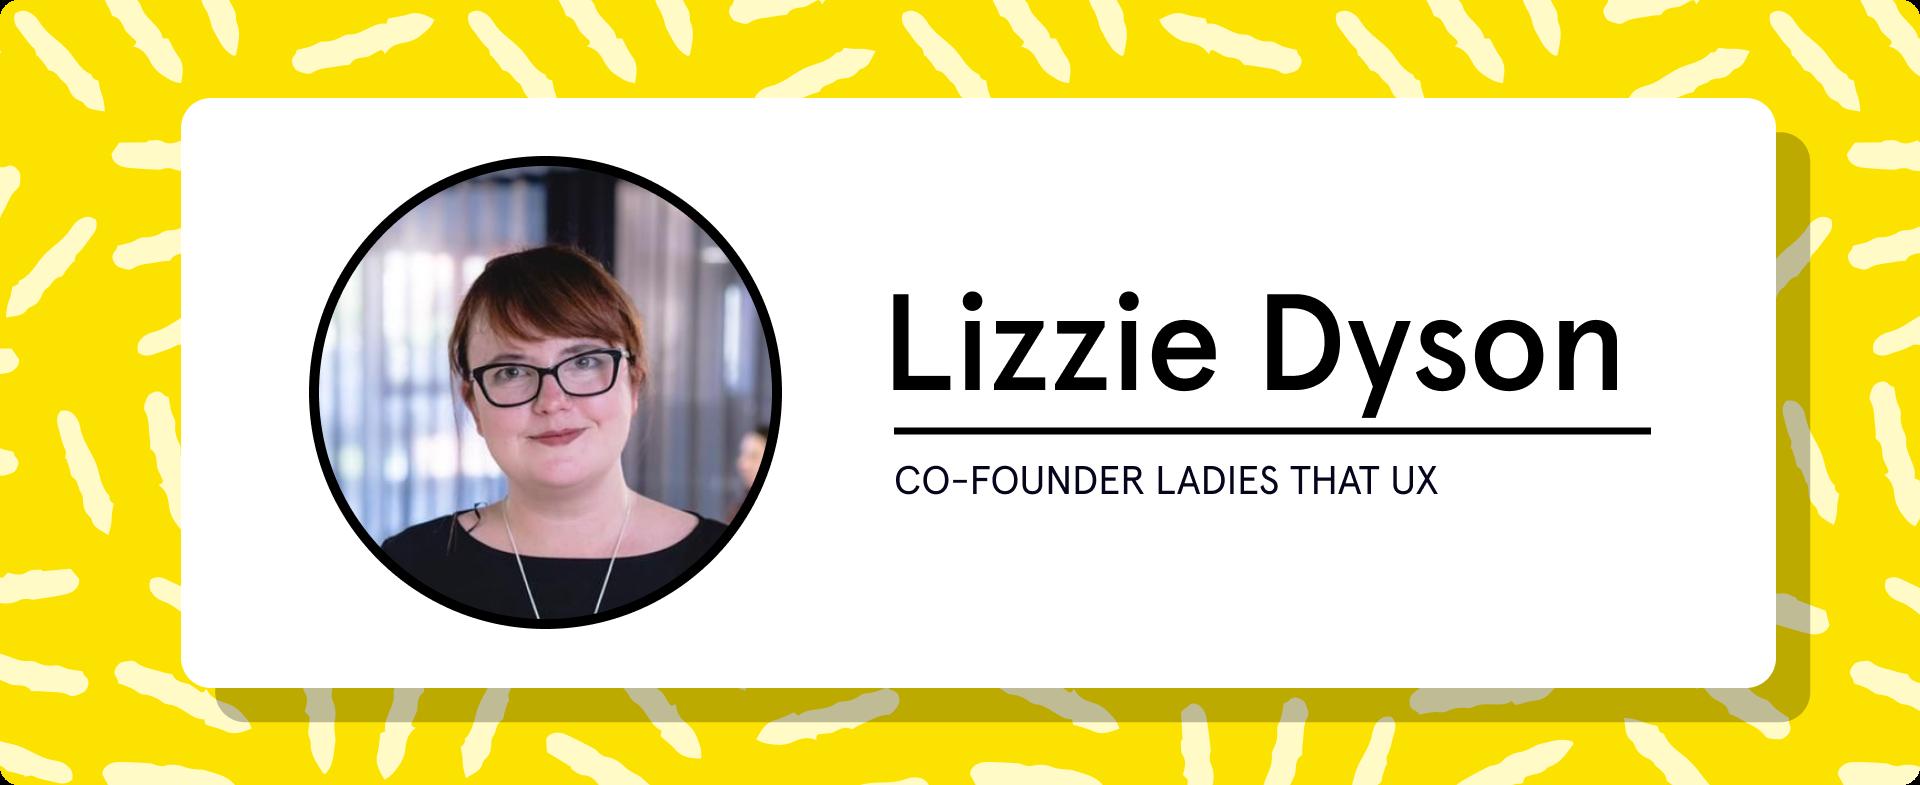 Lizzie Dyson, Co-founder Ladies That Ux